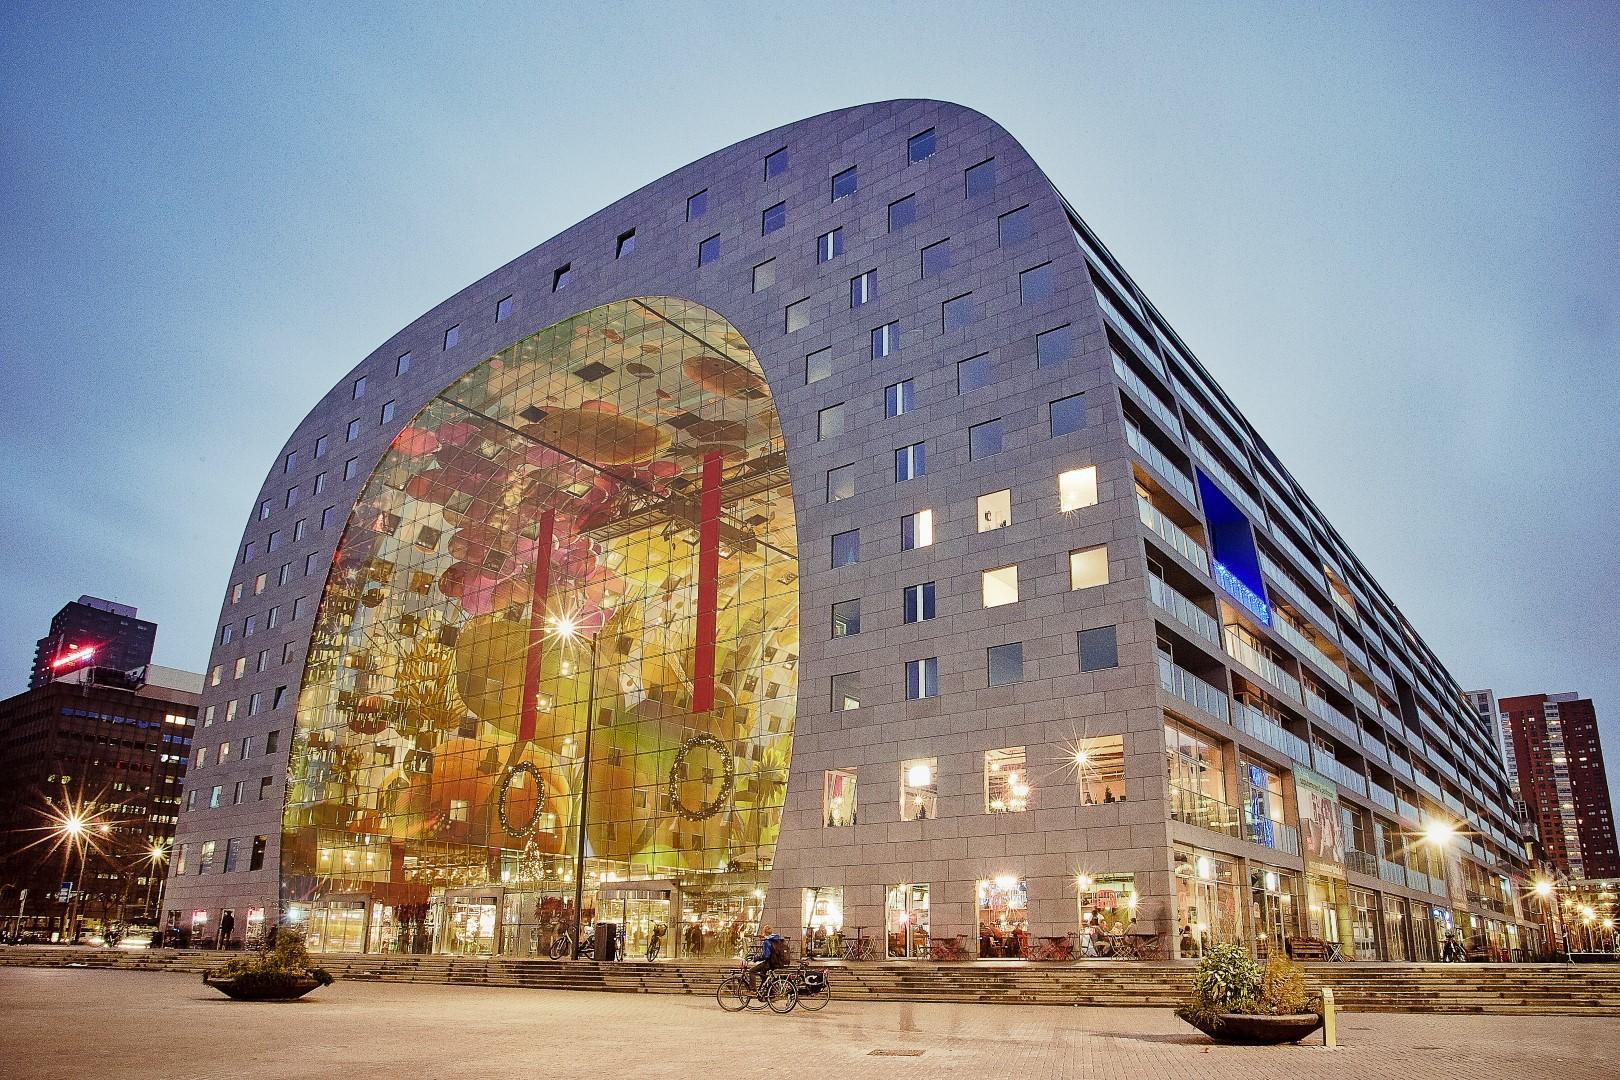 Verlengde Nieuwstraat Rotterdam City Center Zuid Holland Rentals Rotterdam Luxury